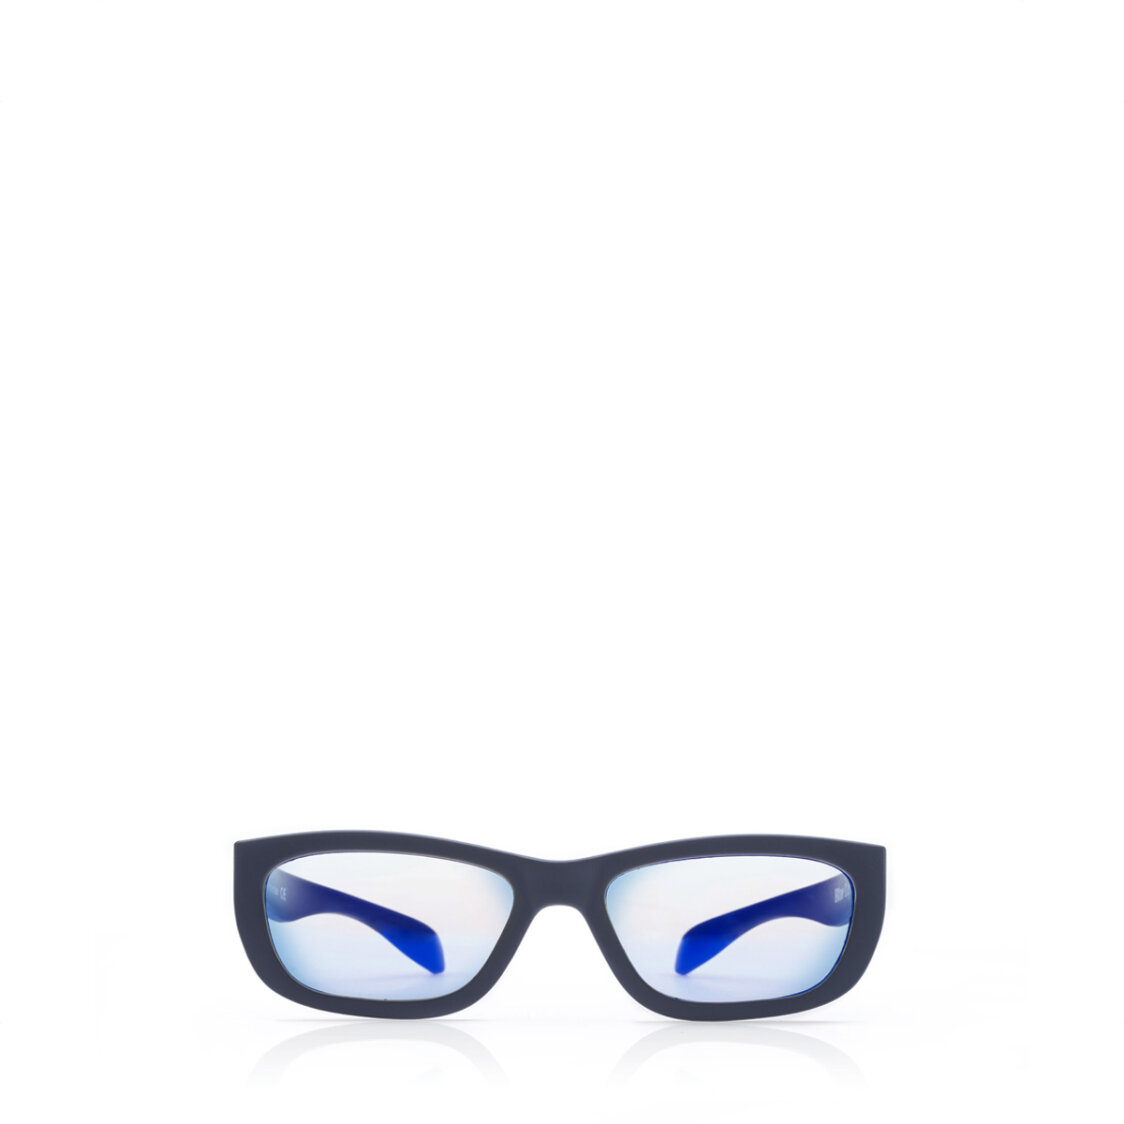 Shadez Eyewear Blue Light Grey Adult 16 years old